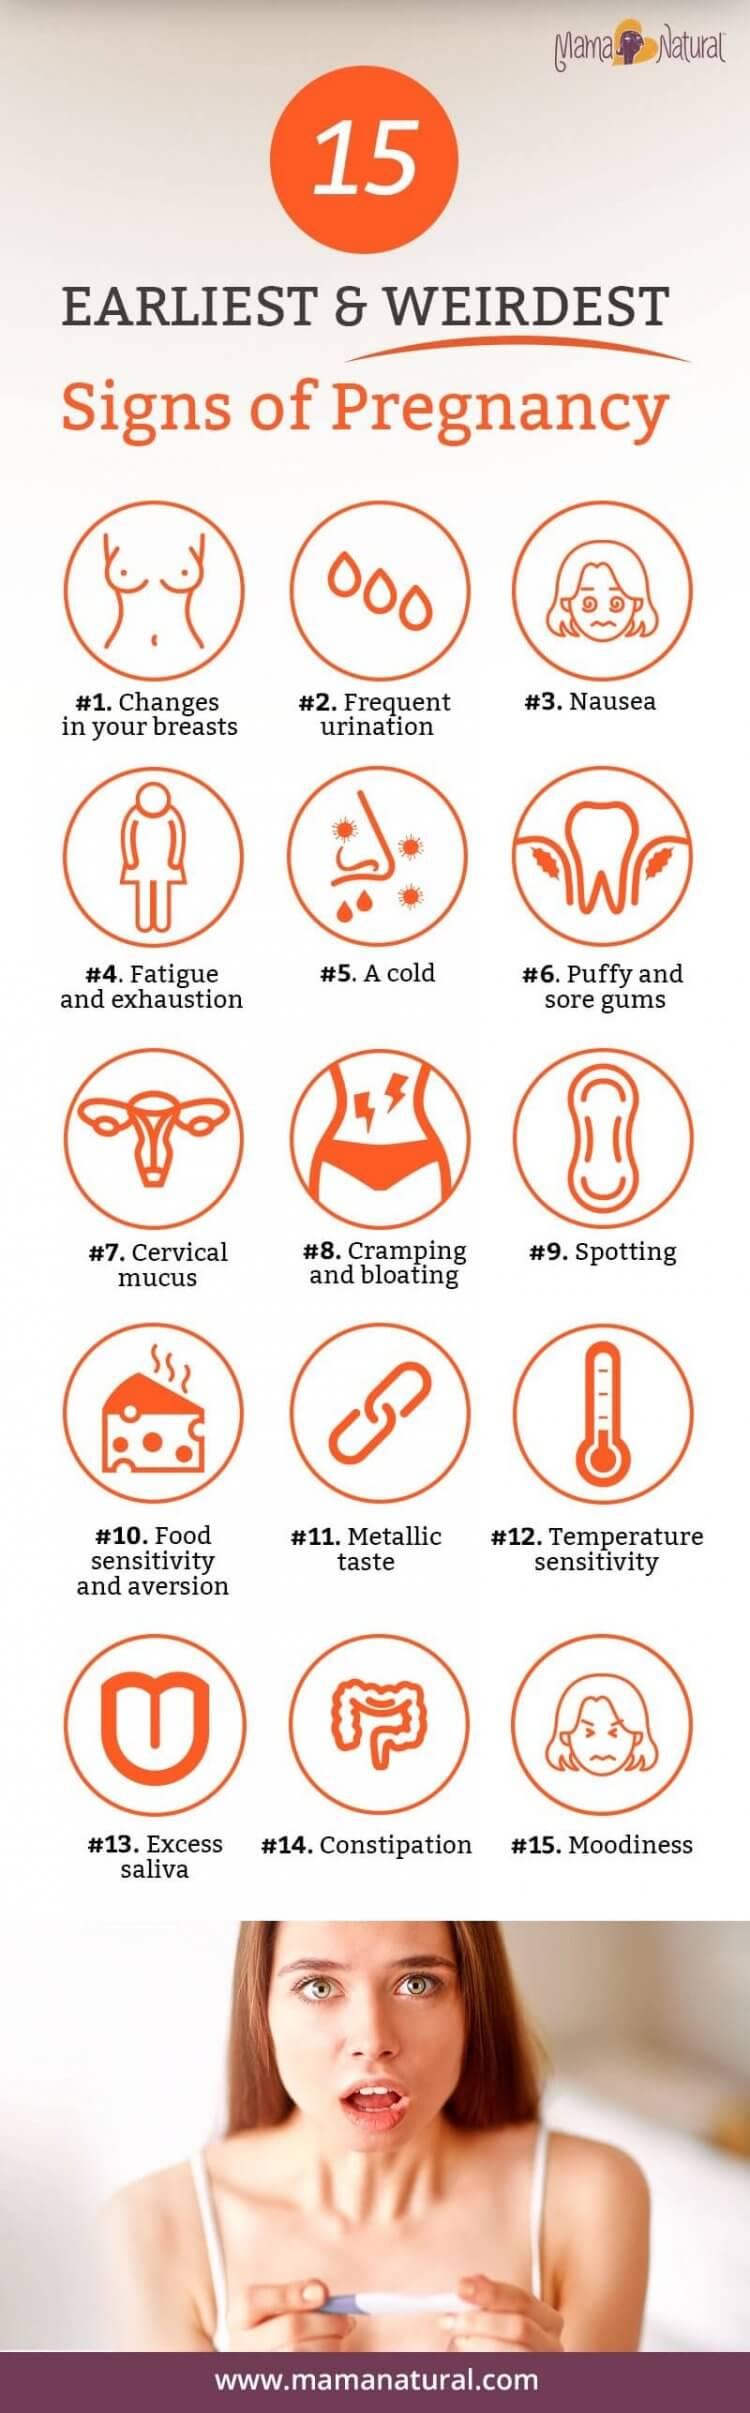 Signs of Pregnancy: The 15 Earliest & Weirdest Symptoms